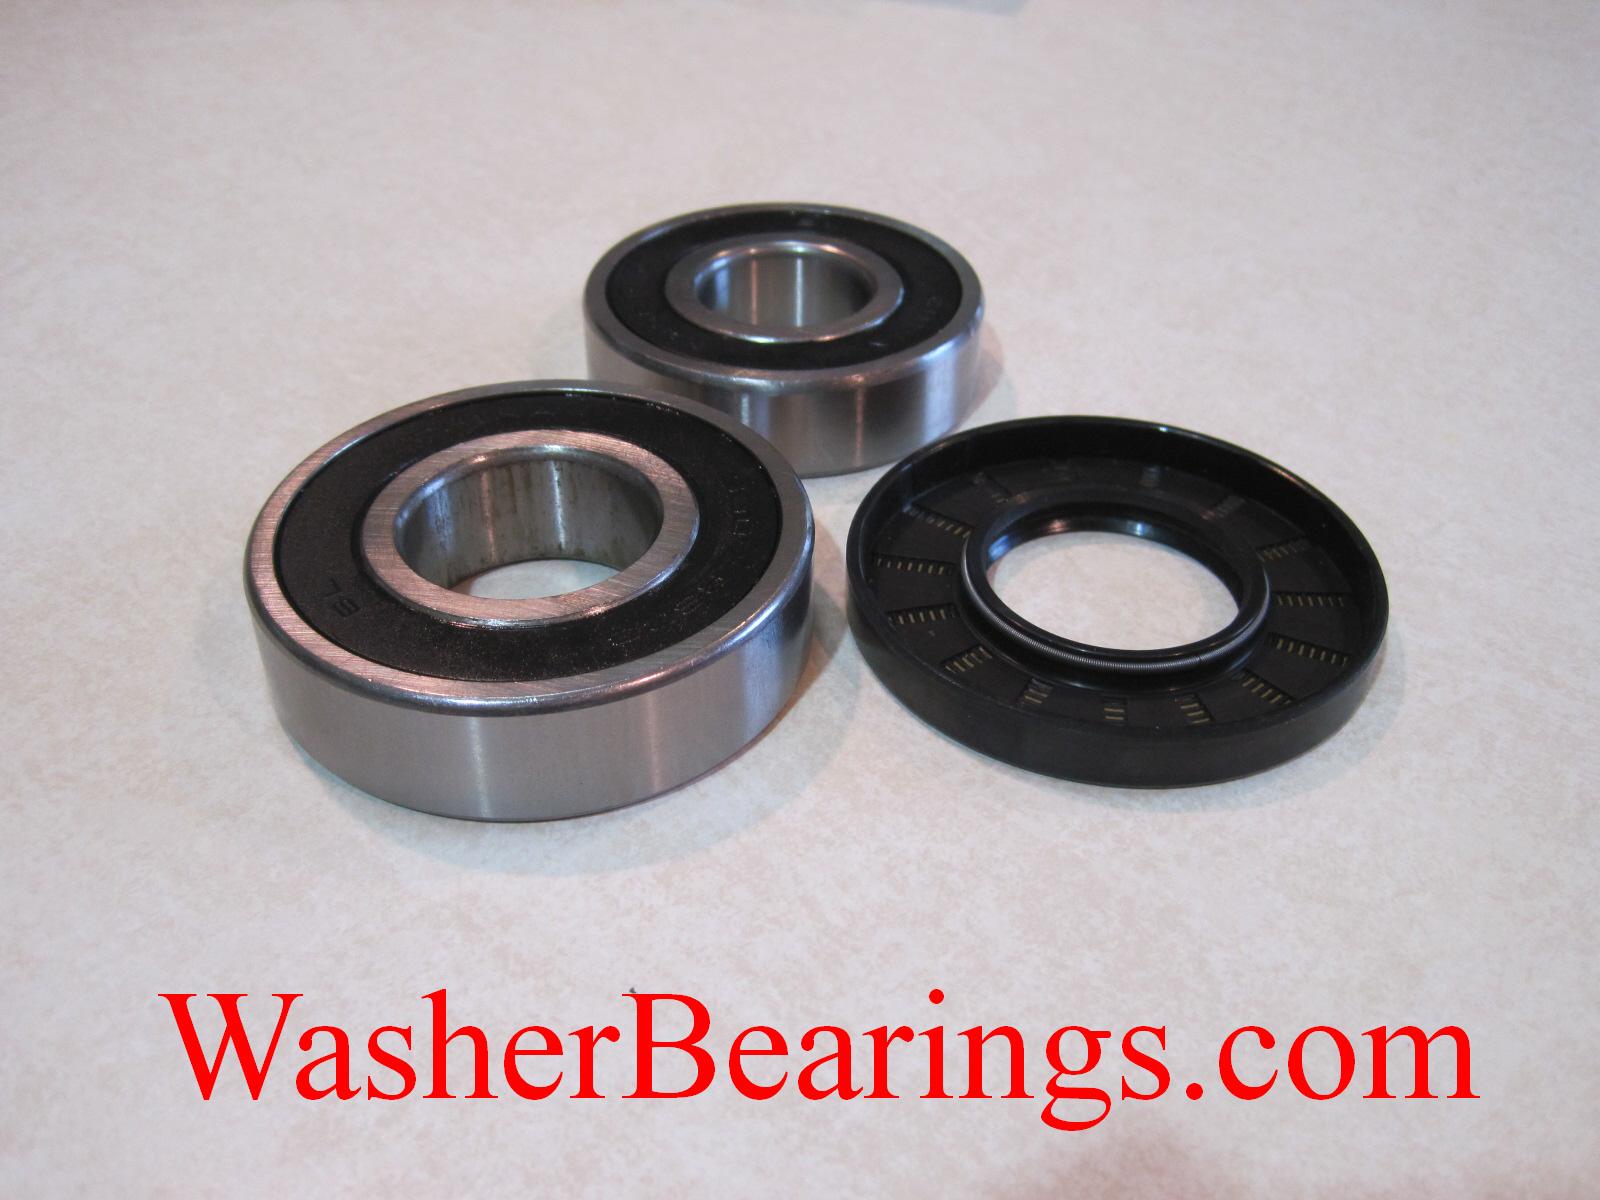 Ghw9250ml0 Bearing Replacement Maytag Neptune Washer Repair